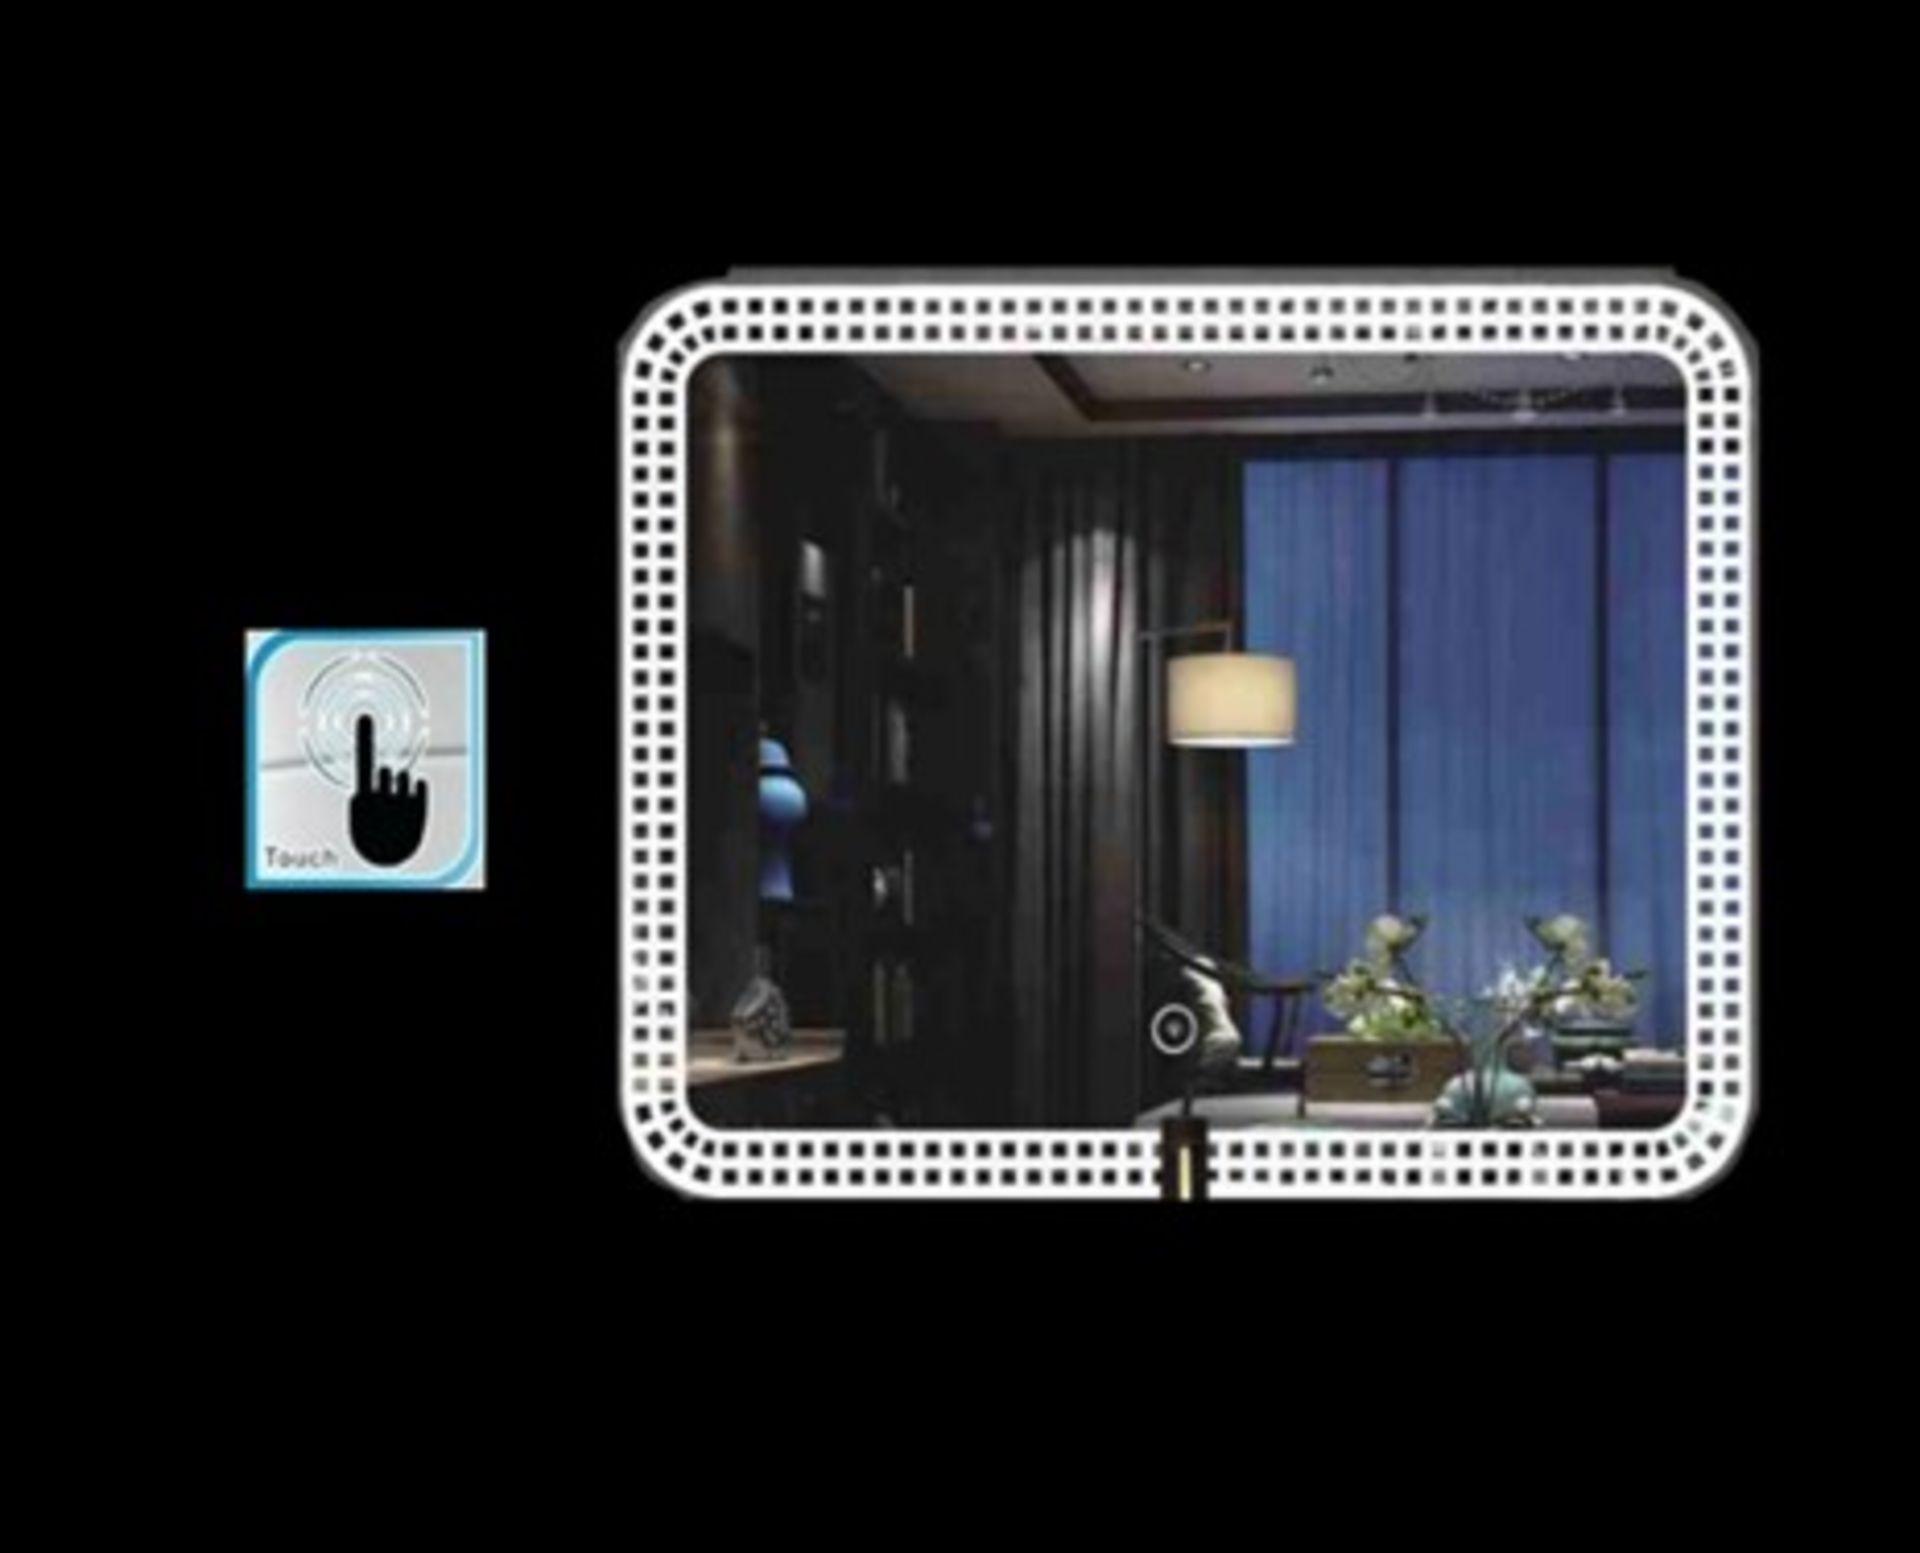 Lot 54 - x 5 Bathroom Illuminated LED Mirrors